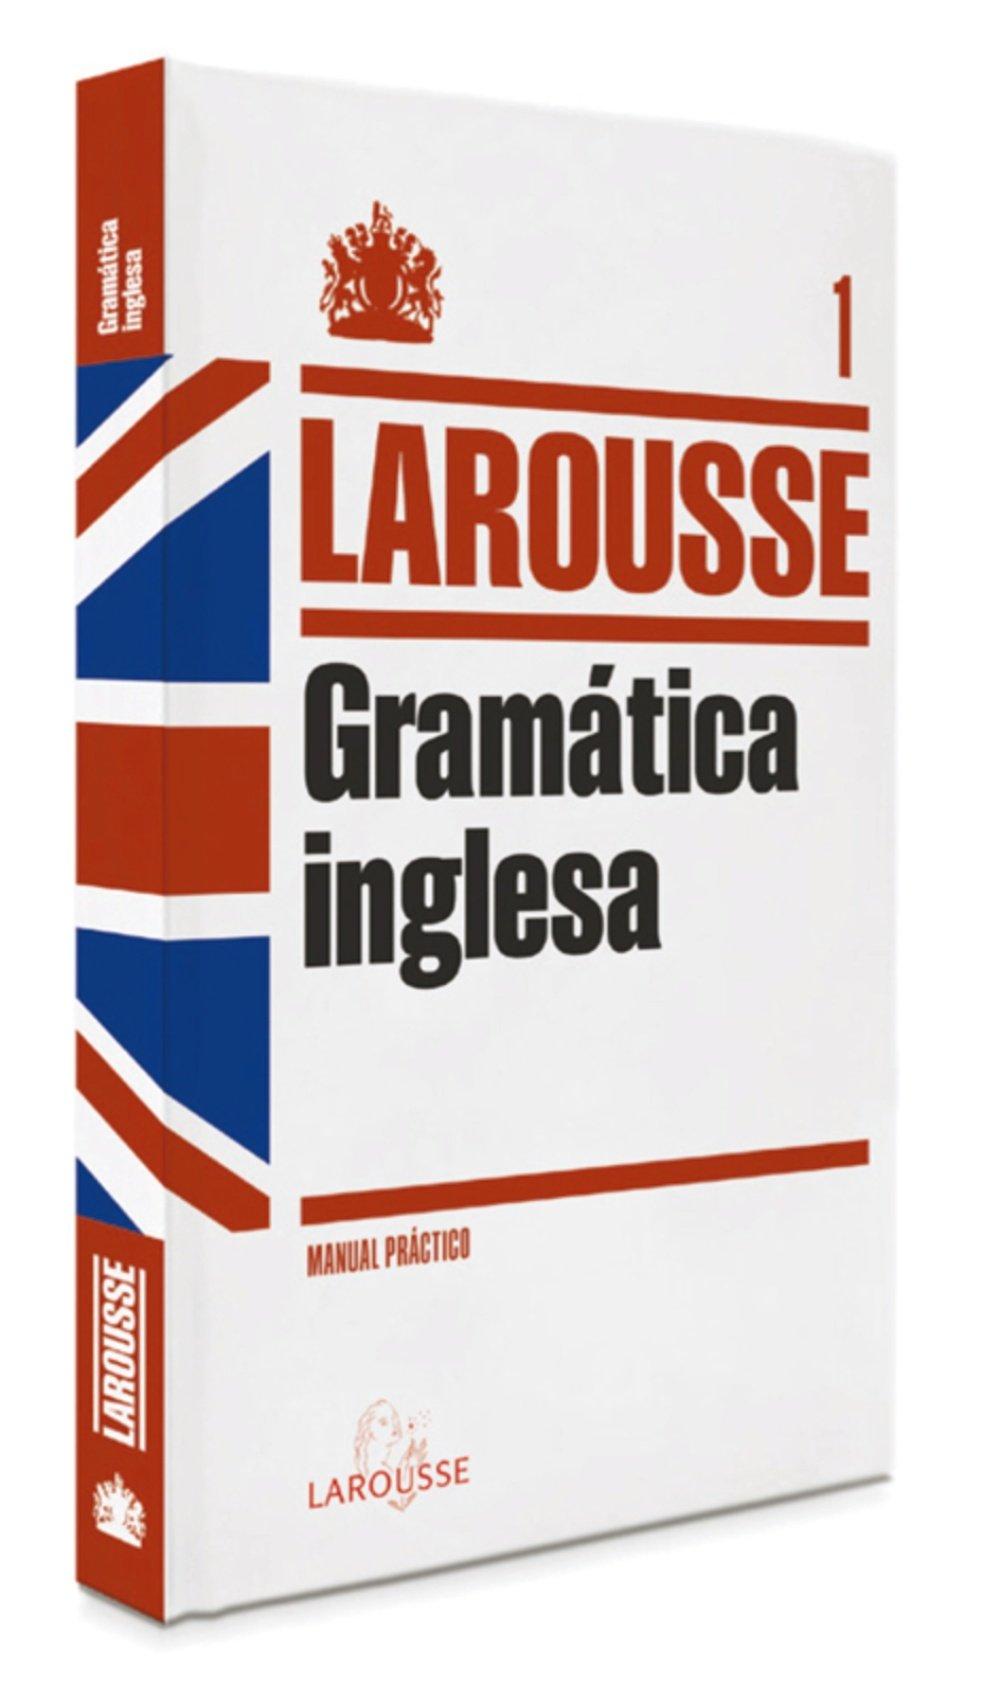 Gramática Inglesa (Larousse - Lengua Inglesa - Manuales Prácticos) Tapa blanda – 17 abr 2012 Aa.Vv. 8415411219 Grammar & Punctuation Spanish: Adult Nonfiction